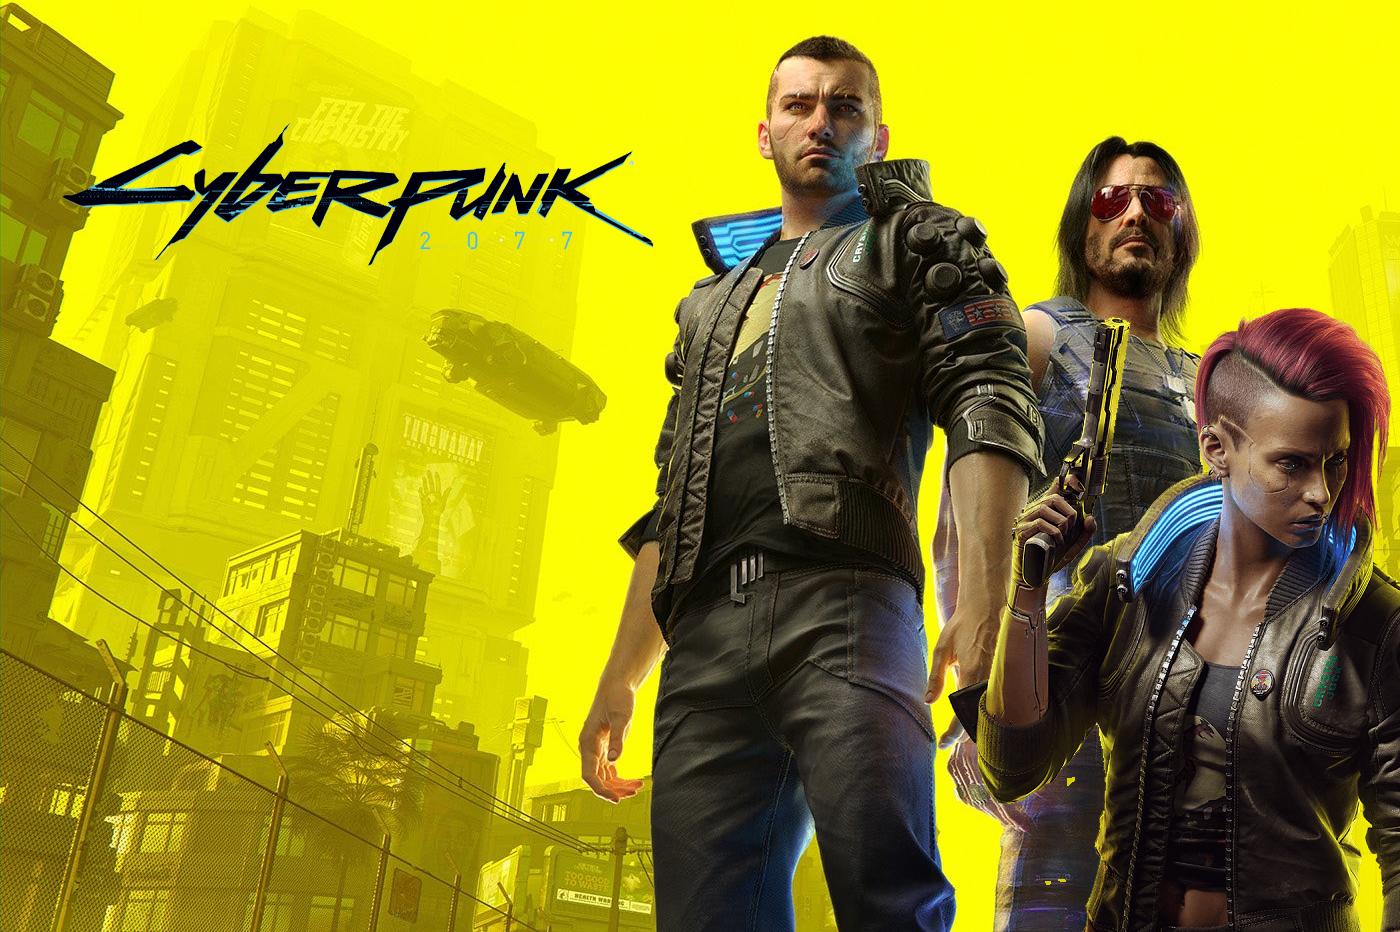 cyberpunk 2077,cyberpunk 2077 gameplay,لعبة cyberpunk 2077,cyberpunk 2077 trailer,cyberpunk 2077 لعبة,cyberpunk,cyberpunk 2077 new gameplay,شرح لعبة cyberpunk 2077,تجربة لعبة cyberpunk 2077,تنزيل لعبة cyberpunk 2077,لعبة cyberpunk,cyberpunk 2077 مراجعة,cyberpunk 2077 gameplay demo,سايبر بانك 2077,لعبة سايبربنك 2077,cyberpunk 2077 pc,cyberpunk 2077 ps5,cyberpunk 2077 ps4,cyberpunk 2077 اخبار,cyberpunk 2077 review,cyberpunk 2077 اون لاين,2077 cyberpunk لعبة,cyberpunk 2077 قصة لعبة   cyberpunk 2077,تحميل لعبة cyberpunk 2077,cyberpunk 2077 gameplay,لعبة cyberpunk 2077,تحميل لعبة cyberpunk 2077 pc,تحميل لعبة cyberpunk 2077 لل pc,cyberpunk 2077 ps5,تحميل لعبة سايبر بانك 2077,تحميل لعبة cyberpunk 2077 للاندرويد,تحميل لعبة cyberpunk 2077 للكمبيوتر مجانا,متطلبات تشغيل لعبة cyberpunk 2077,cyberpunk,مراجعة لعبة cyberpunk 2077,cyberpunk 2077 news,cyberpunk 2077 mobile,تحميل لعبة سايبر بانك 2077 مهكرة,cyberpunk 2077 trailer,تحميل لعبة cyberpunk 2077 للكمبيوتر